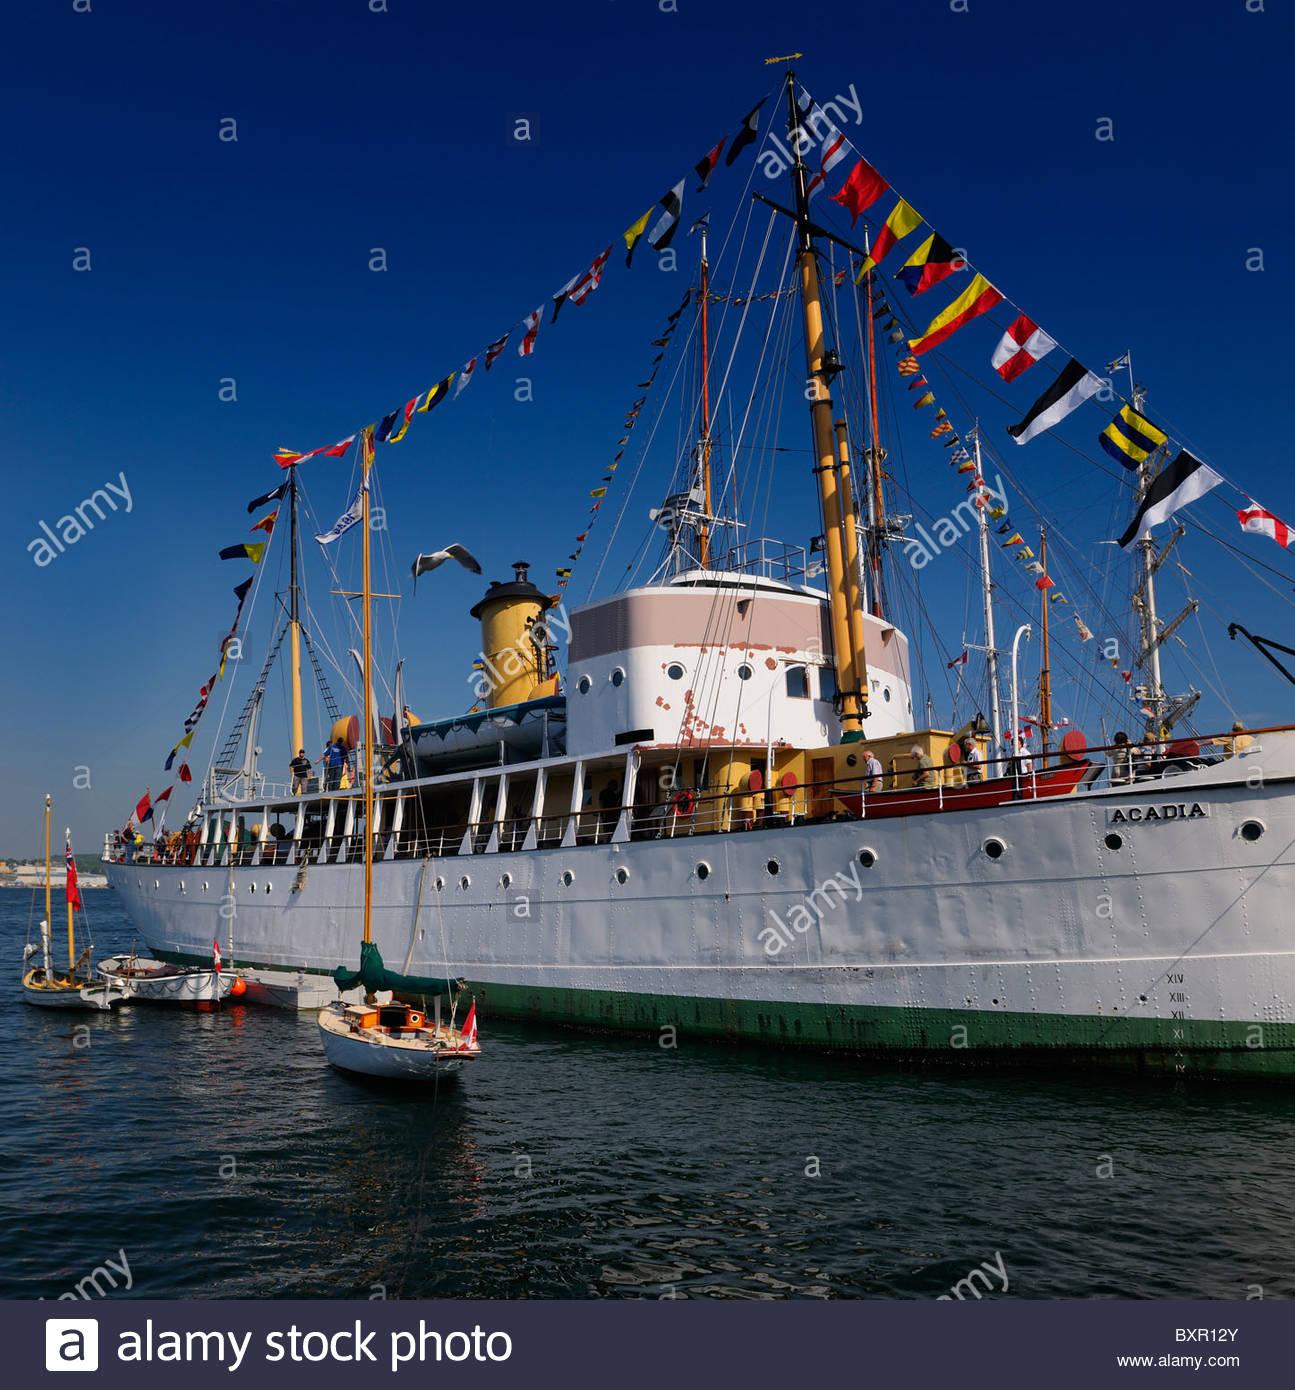 CSS Acadia scientific ship at Halifax Harbour Tall Ships Festival Nova Scotia Canada 2009 - Stock Image